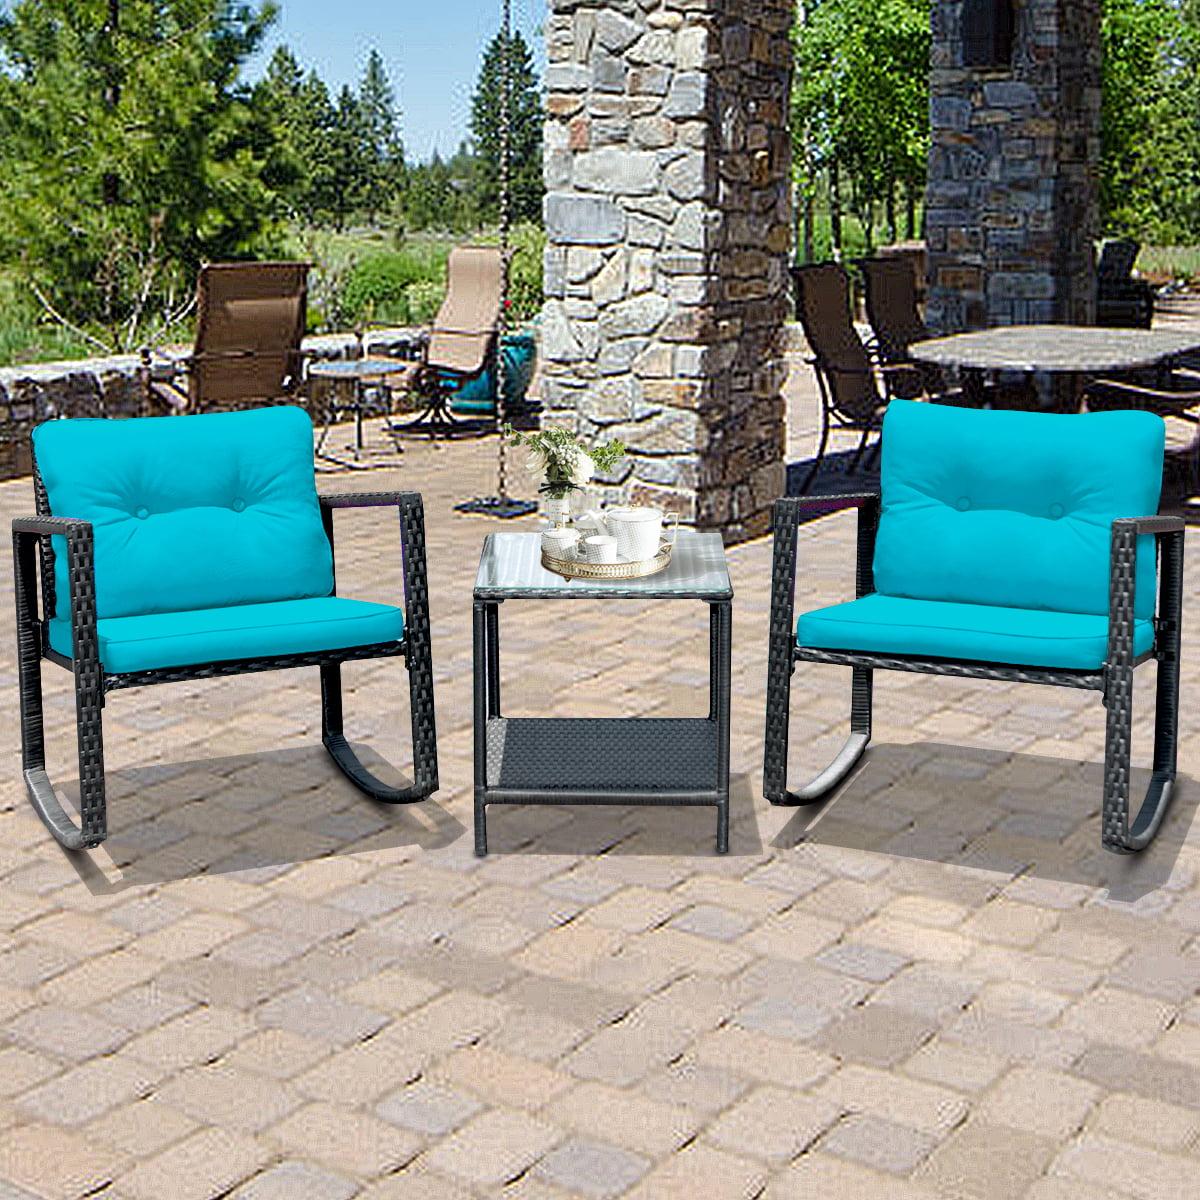 gymax 3pcs rattan rocking chair table set patio furniture set w blue cushions